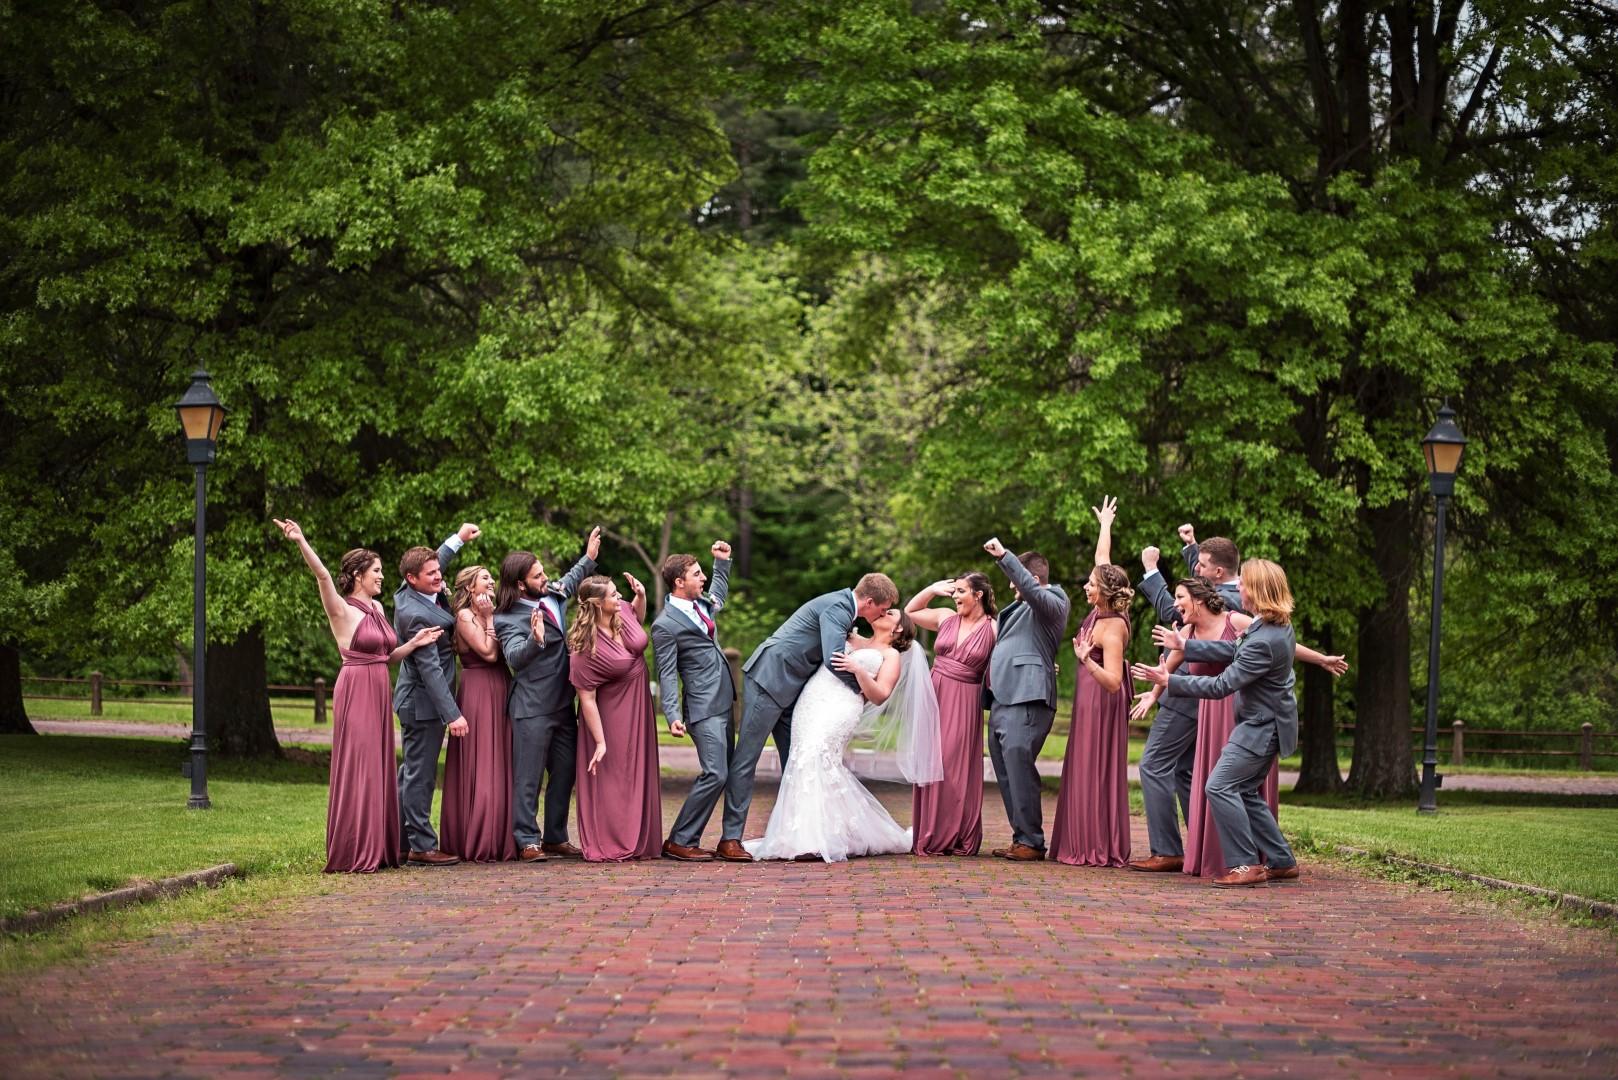 Courtney & Matt Dairy Barn Wedding May 2019_19 (Large).jpg